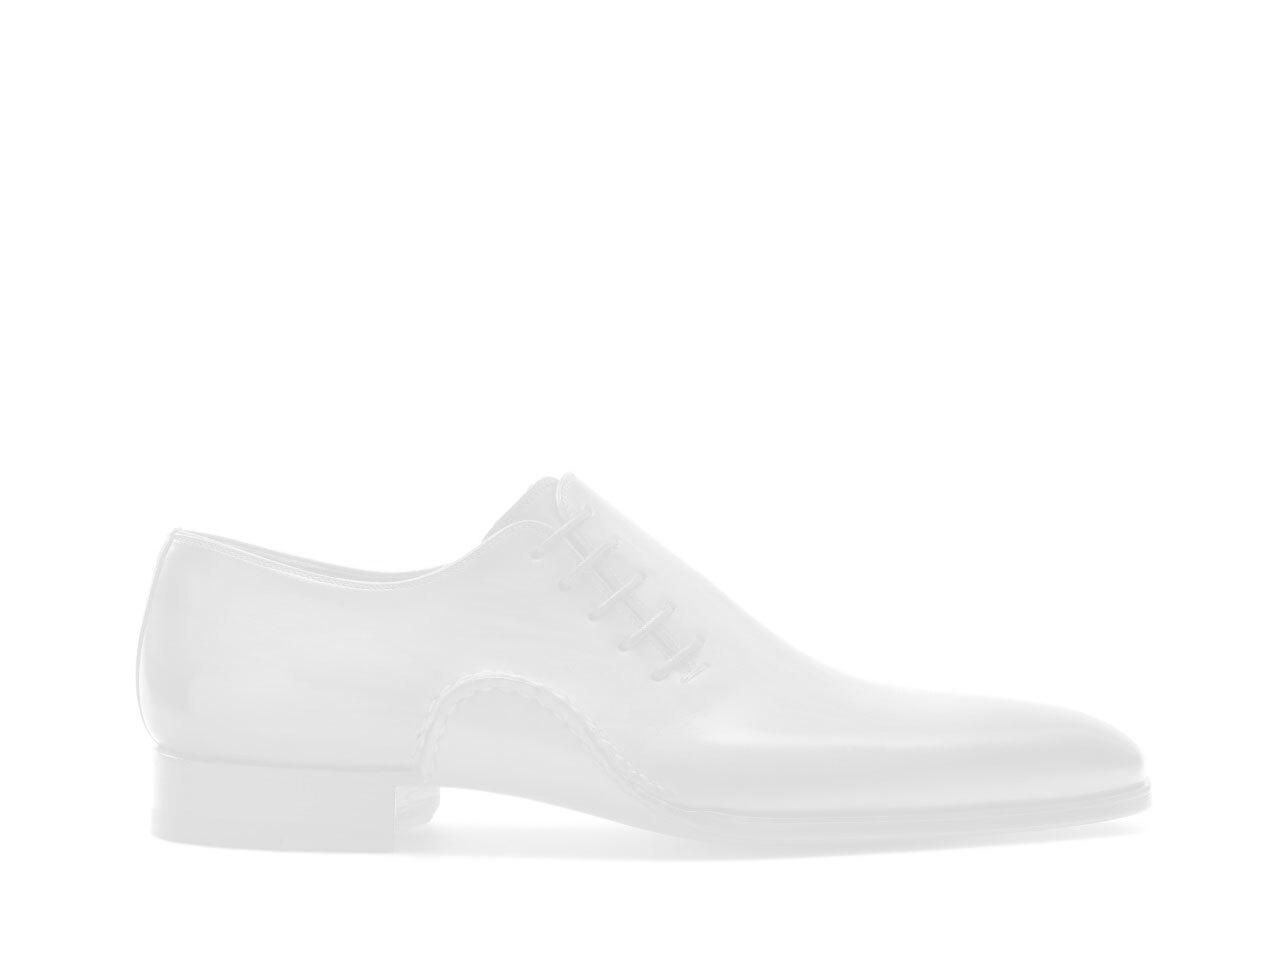 Side view of the Magnanni Allariz White Men's Sneakers